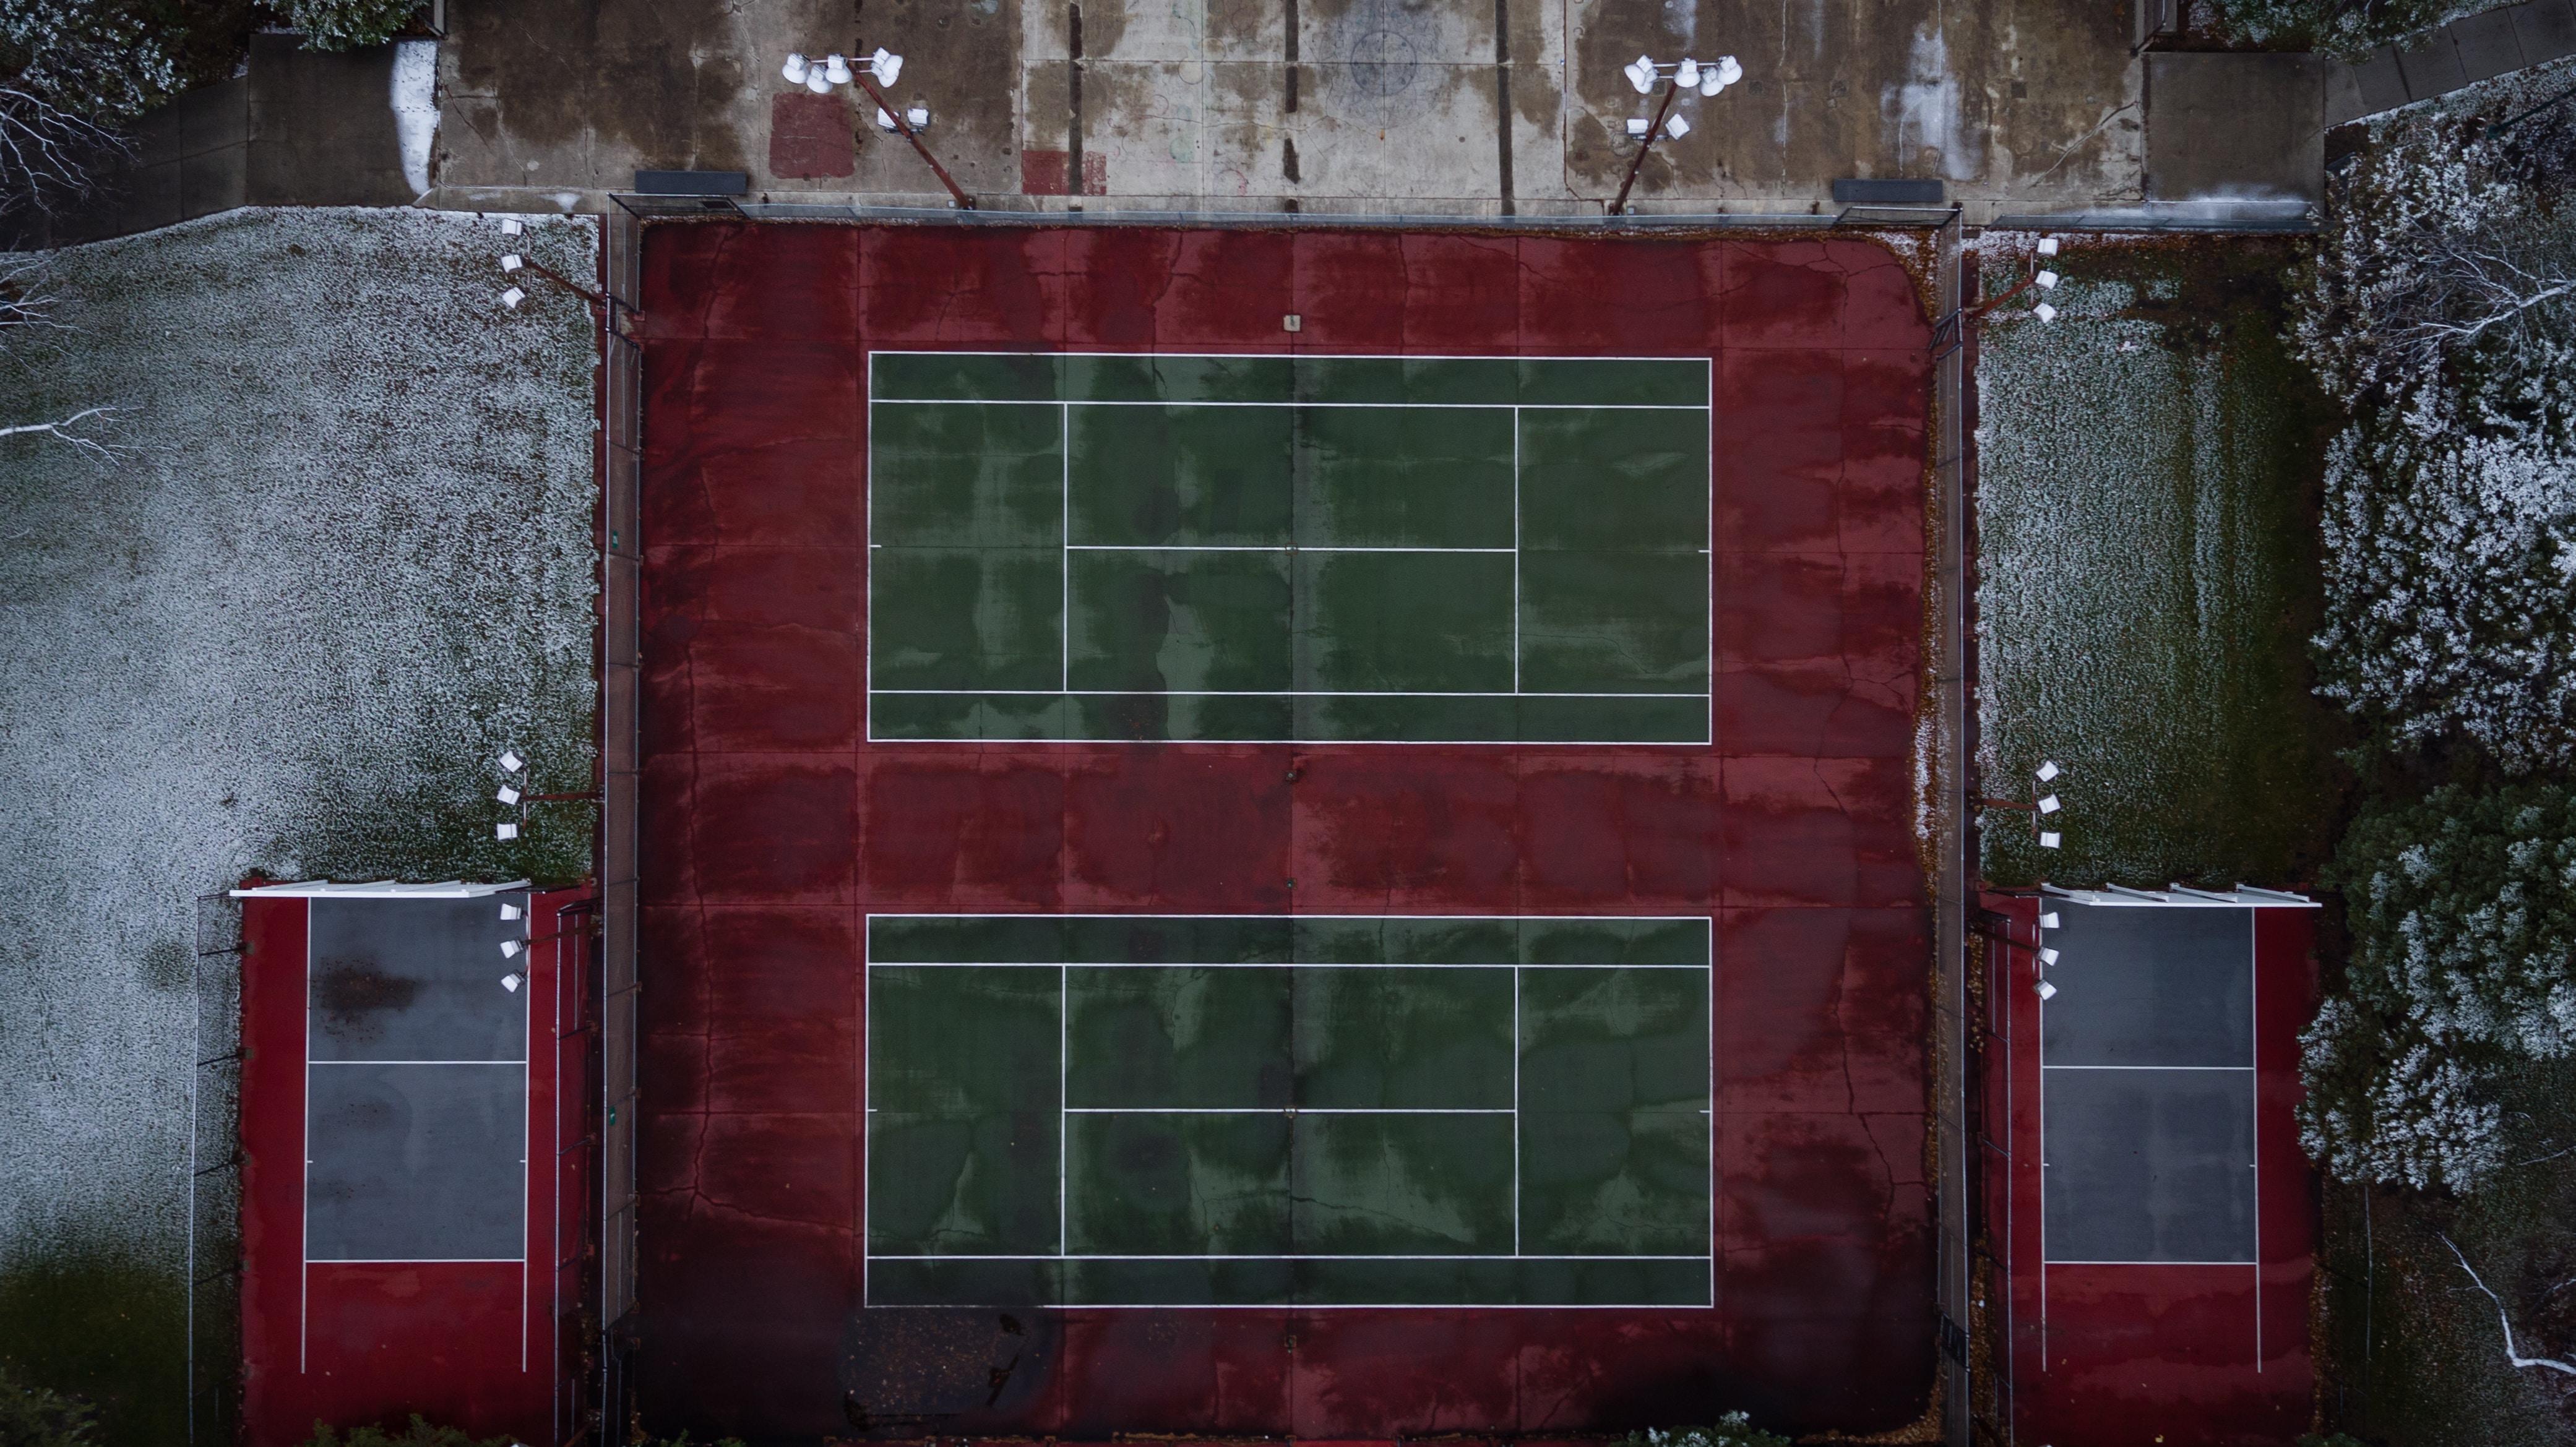 bird's-view photo of tennis court